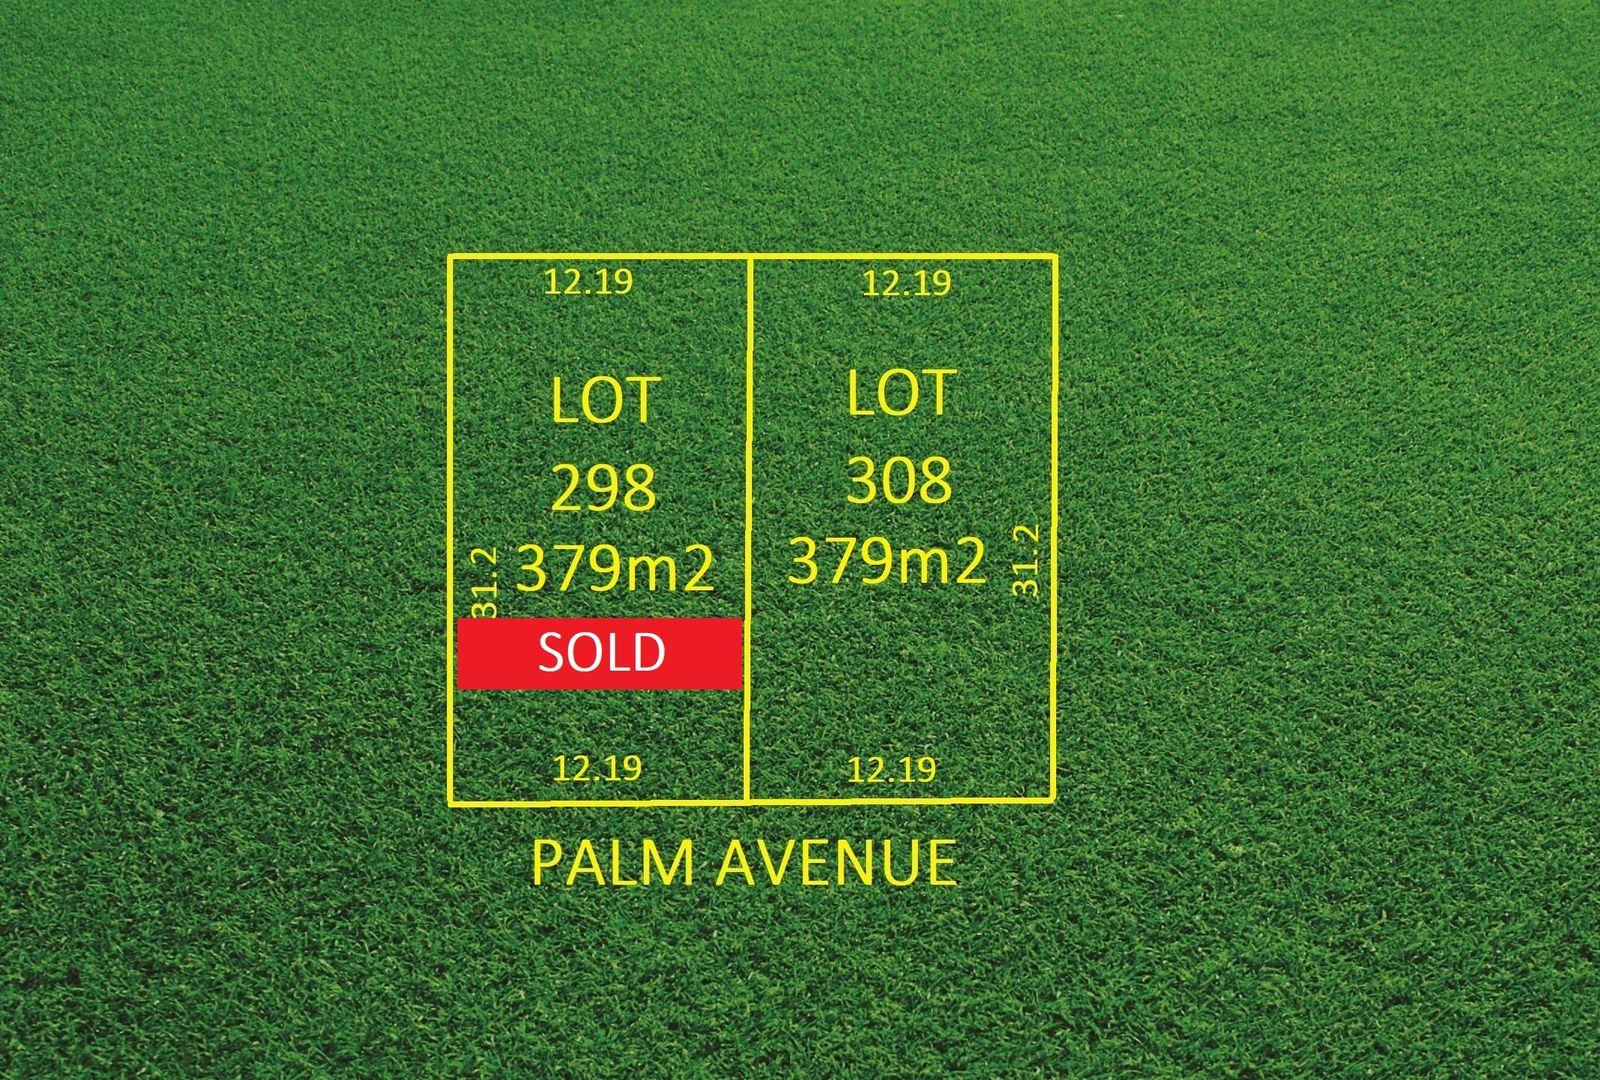 61 & 61A Palm Avenue, Royal Park SA 5014, Image 0